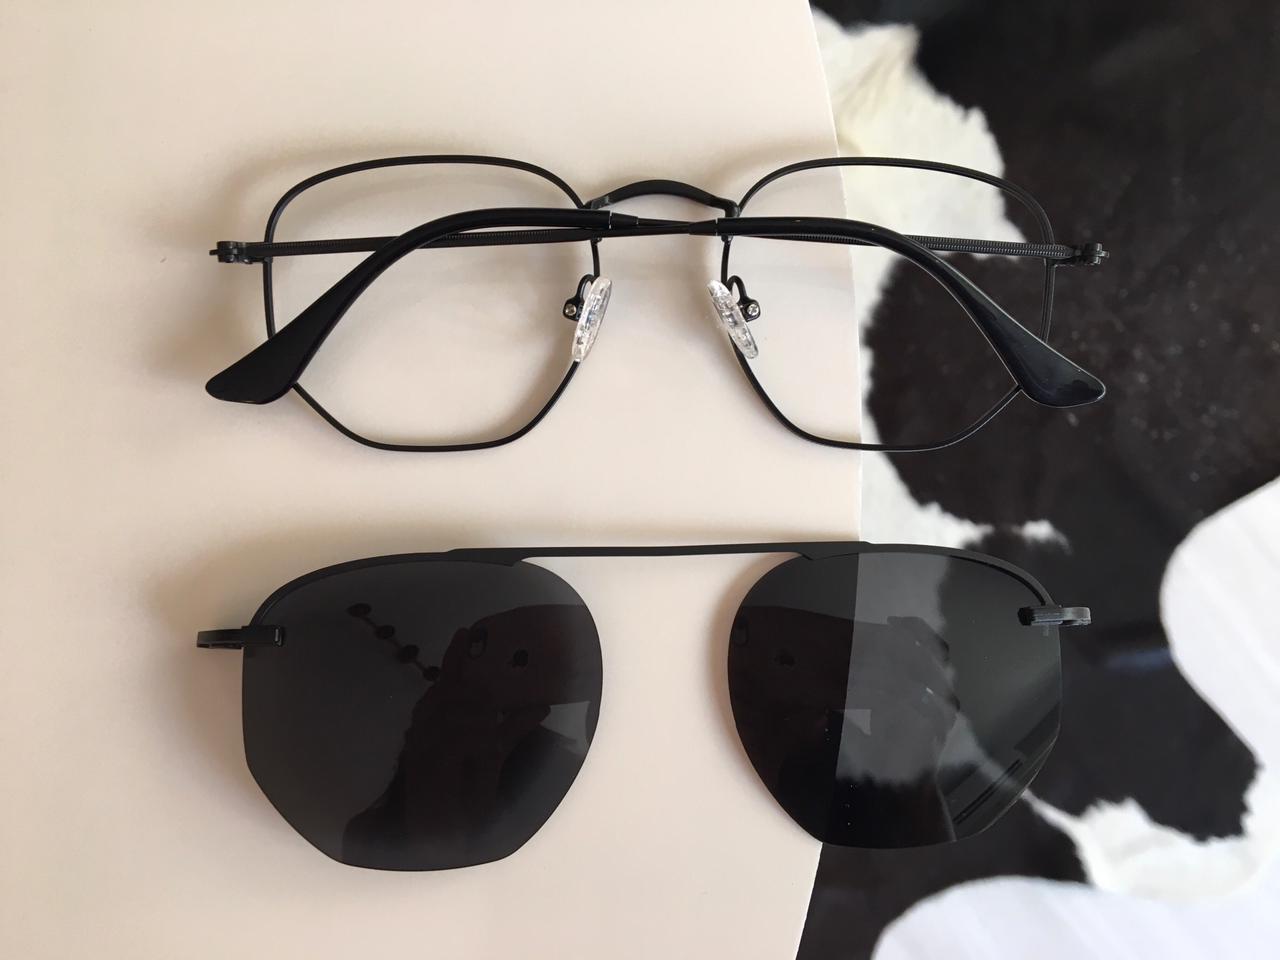 Óculos Clipon 2 em 1 Yasmin Preto